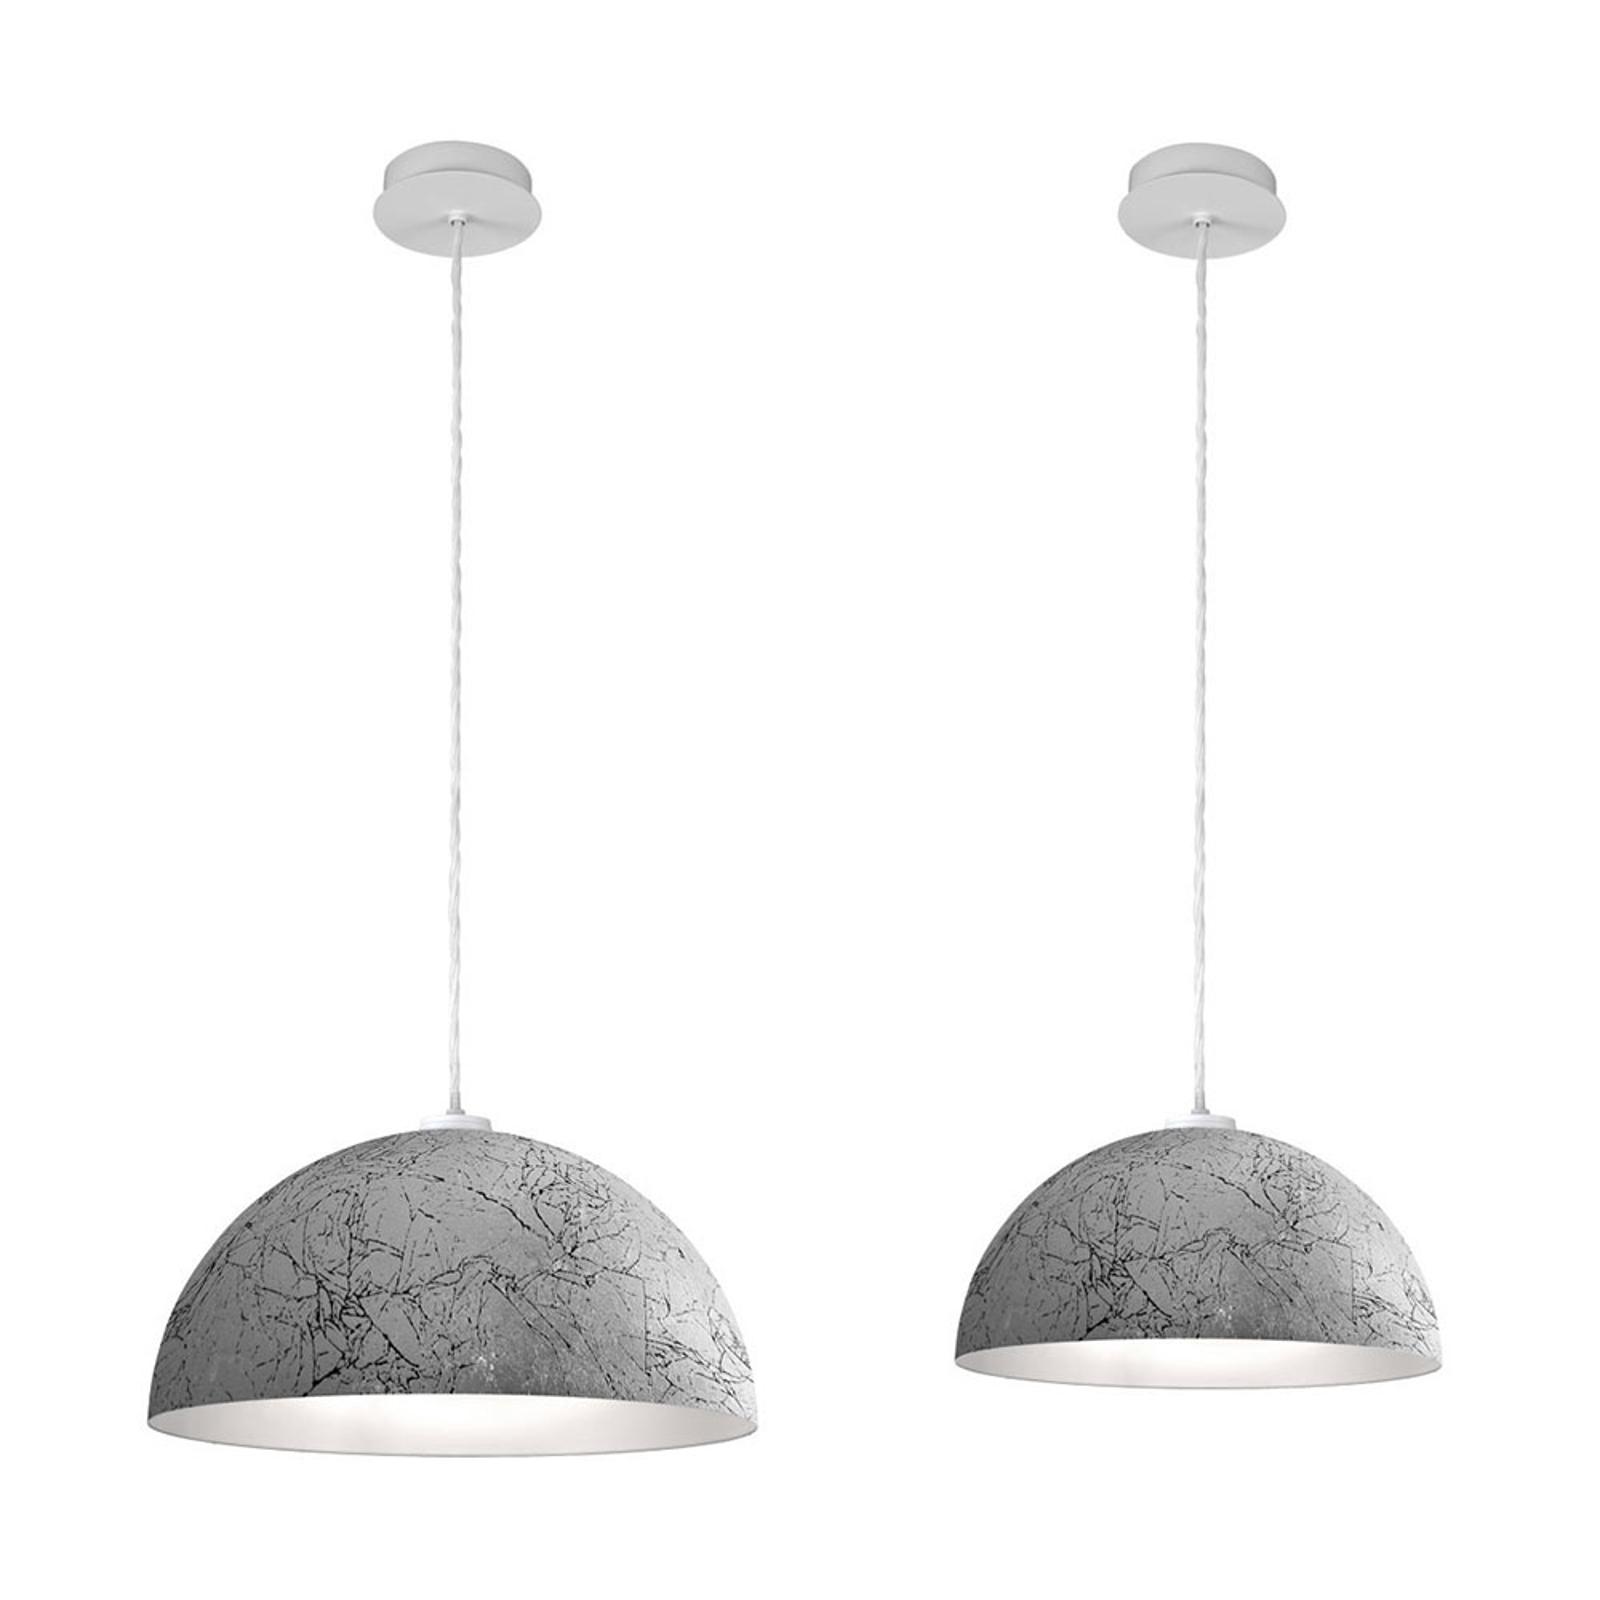 Lampa wisząca Cult Vintage, srebrna, Ø 40 cm